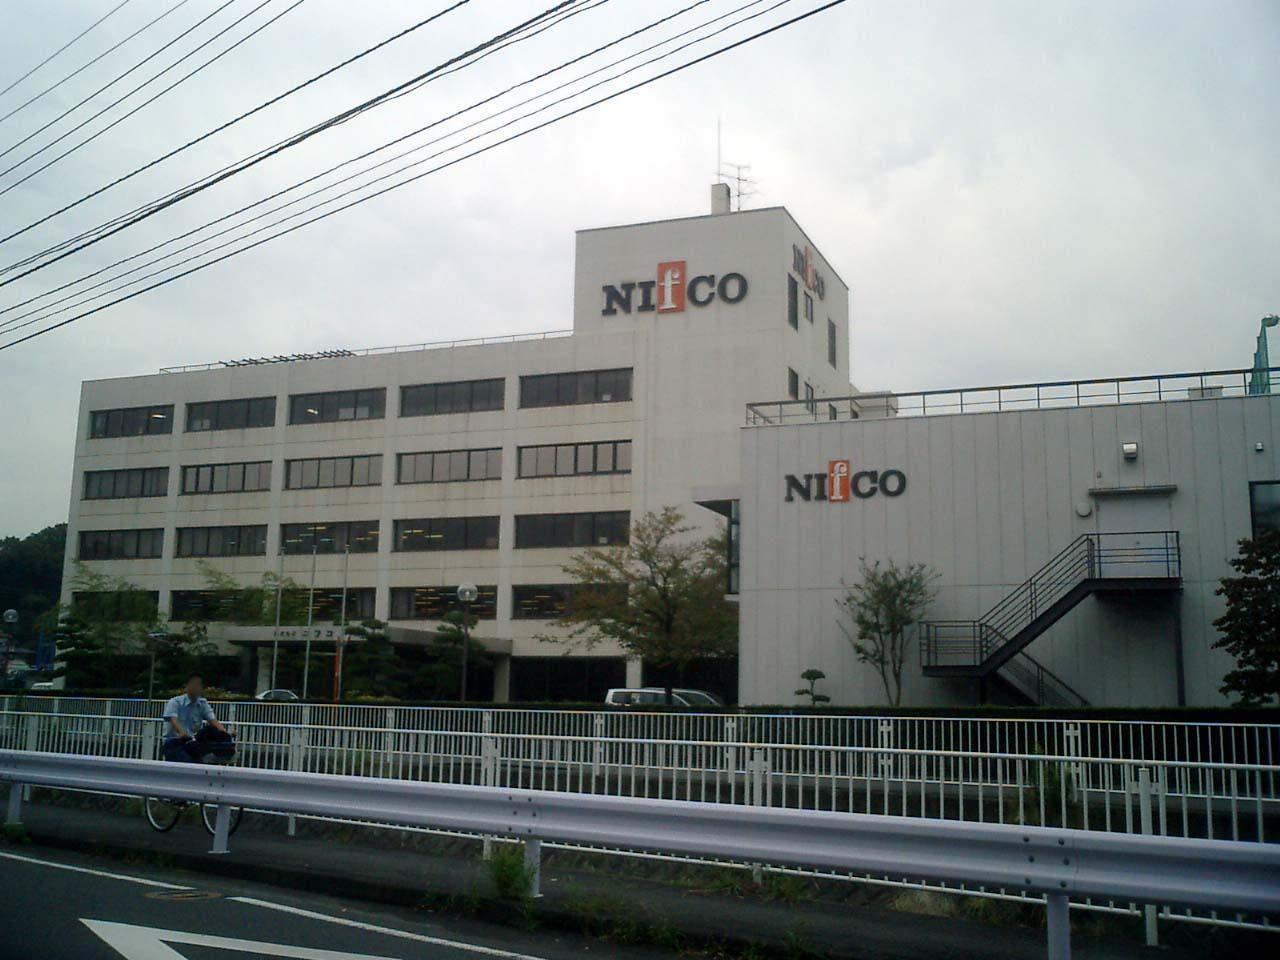 Monolitplast news A Nifco